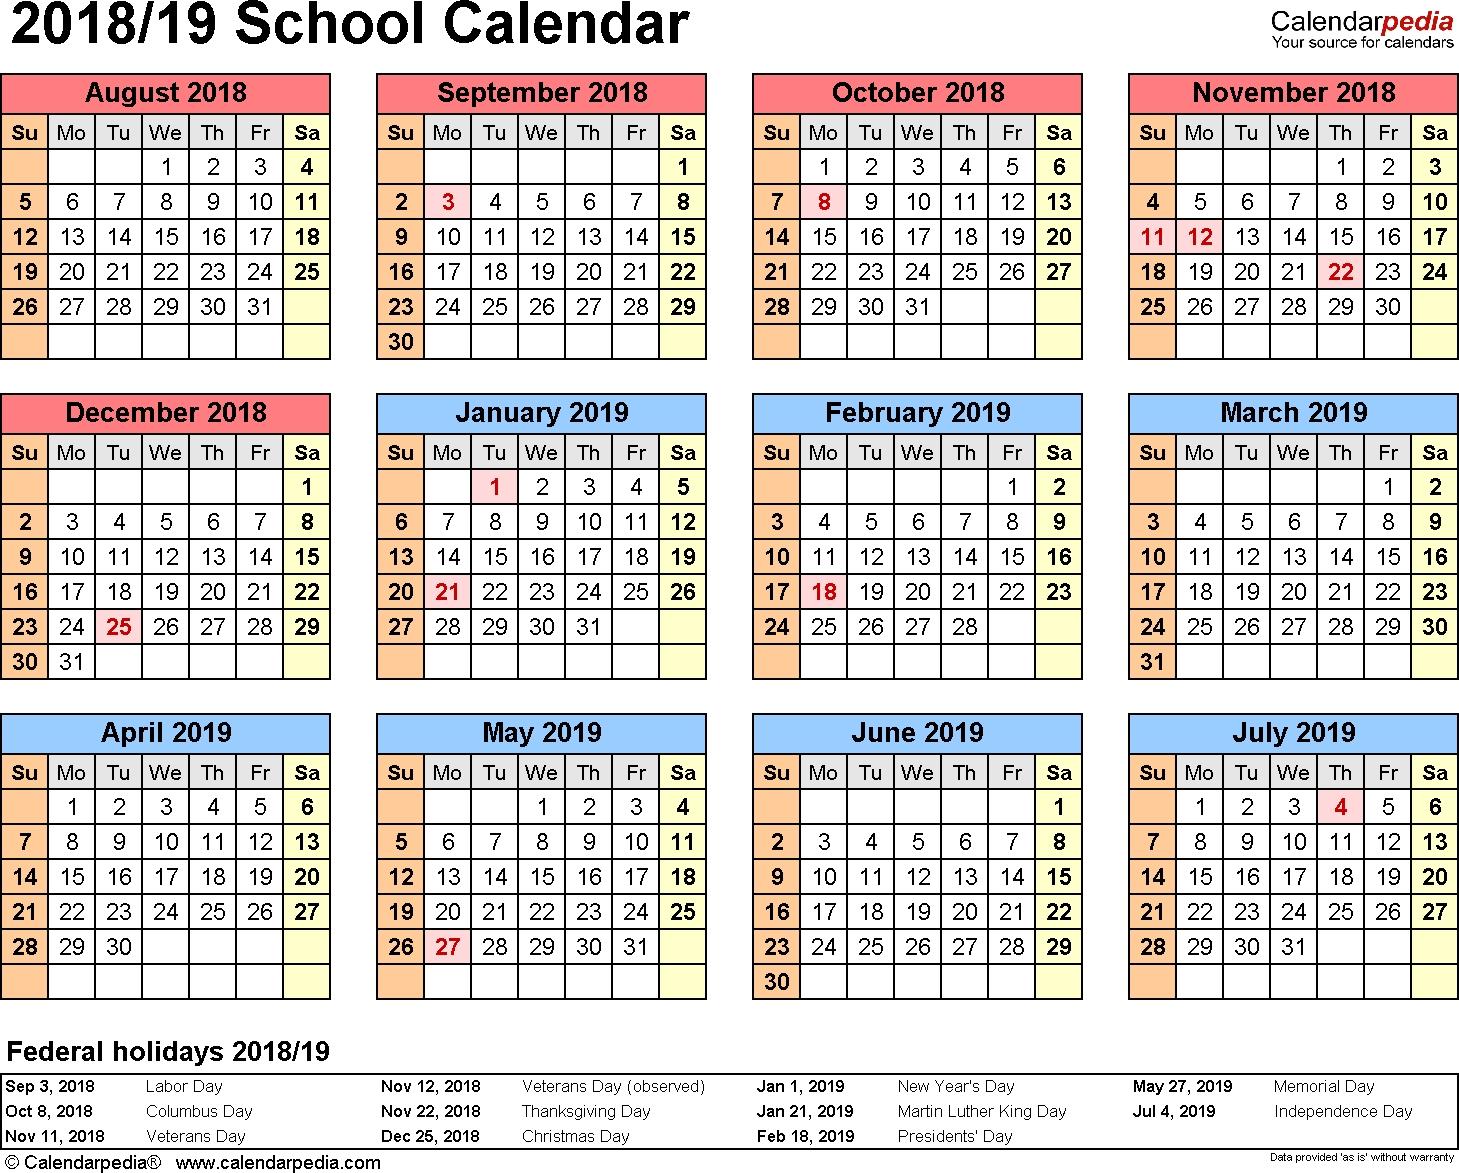 School Calendars 2018/2019 As Free Printable Word Templates-School Calendar Blank At A Glance